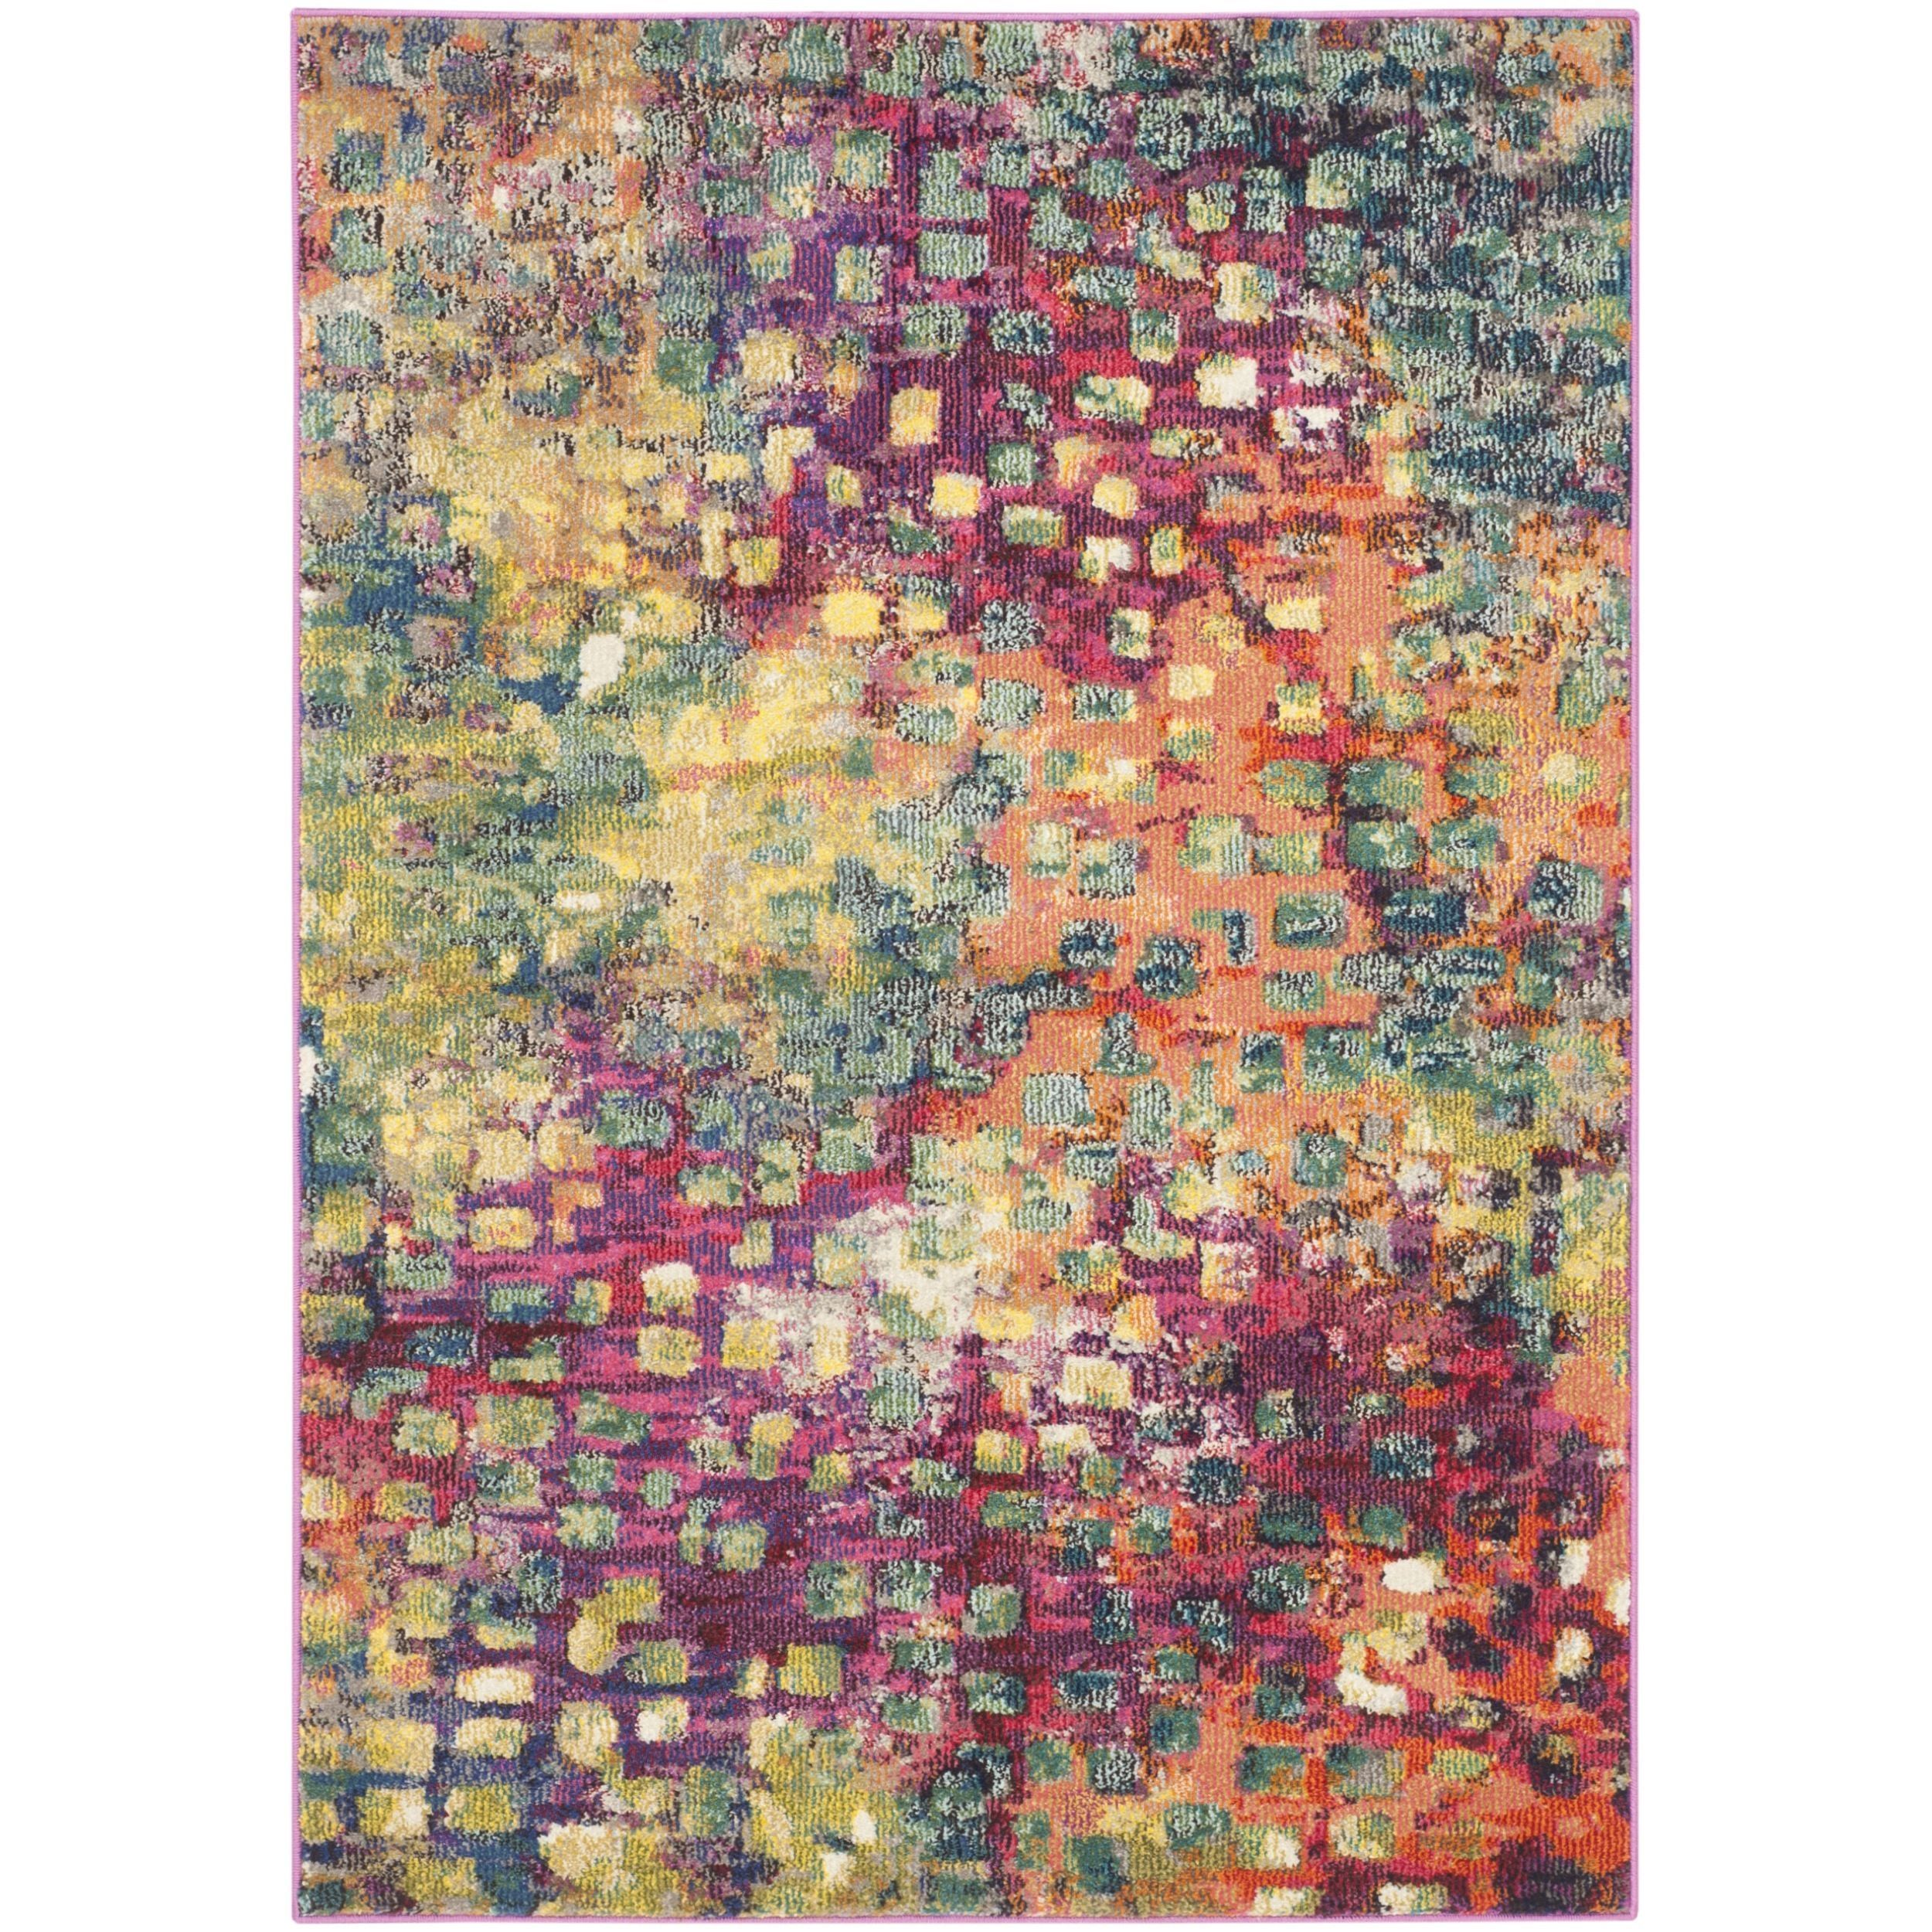 Safavieh Monaco Pink/ Multi Rug (4' x 5'7) - Overstock Shopping - Great Deals on Safavieh 3x5 - 4x6 Rugs